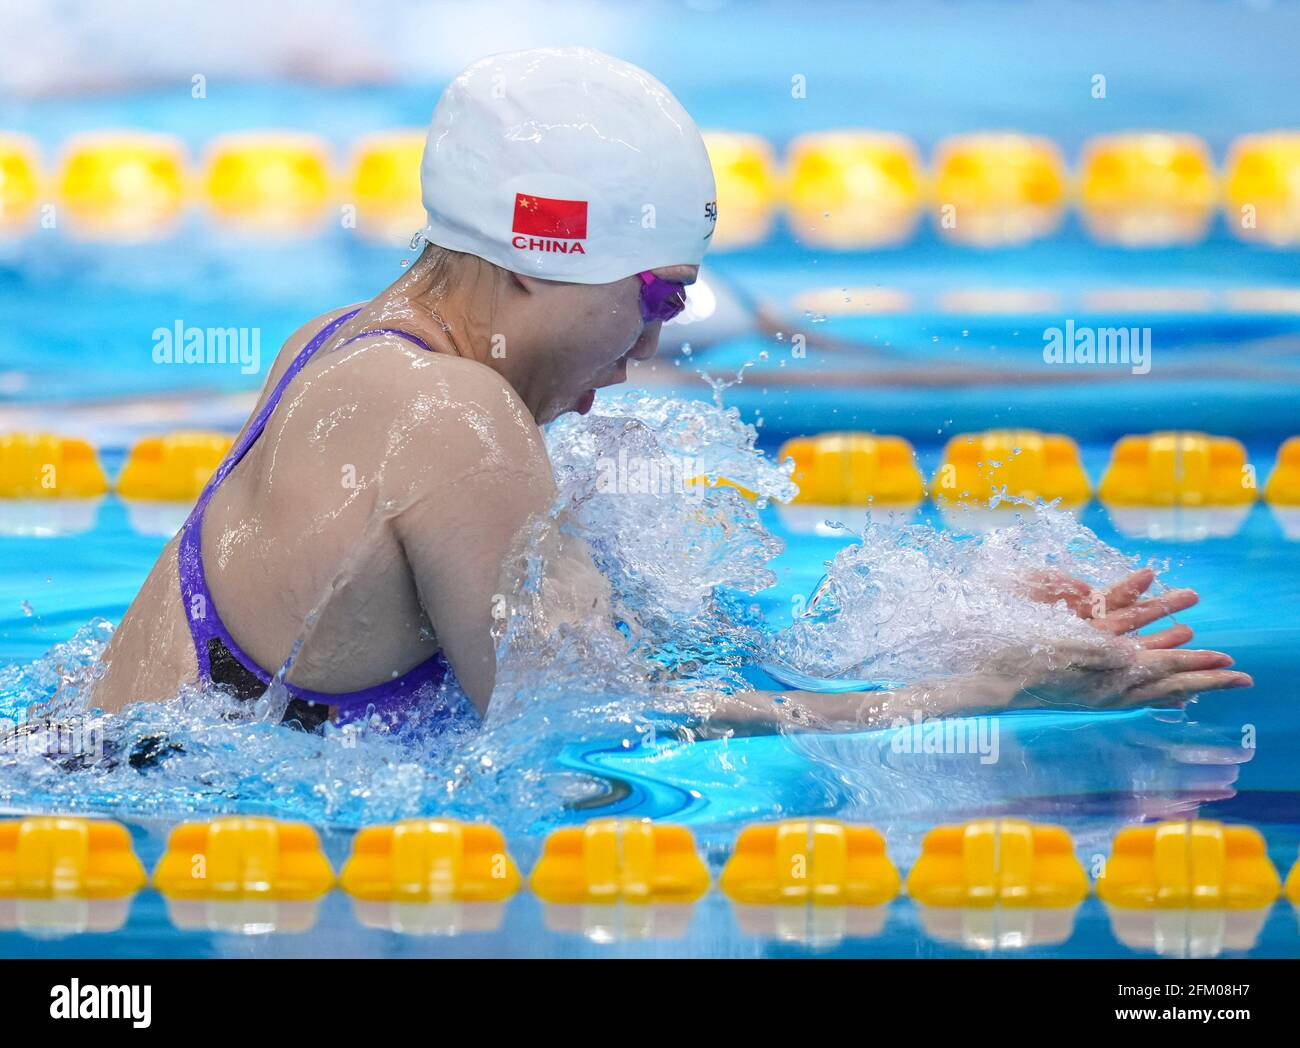 Qingdao, China. 5th May, 2021. Tang Qianting of Shanghai competes during the women's 200m breaststroke semifinal at the 2021 Chinese National Swimming Championships in Qingdao, east China, May 5, 2021. Credit: Xu Chang/Xinhua/Alamy Live News Stock Photo